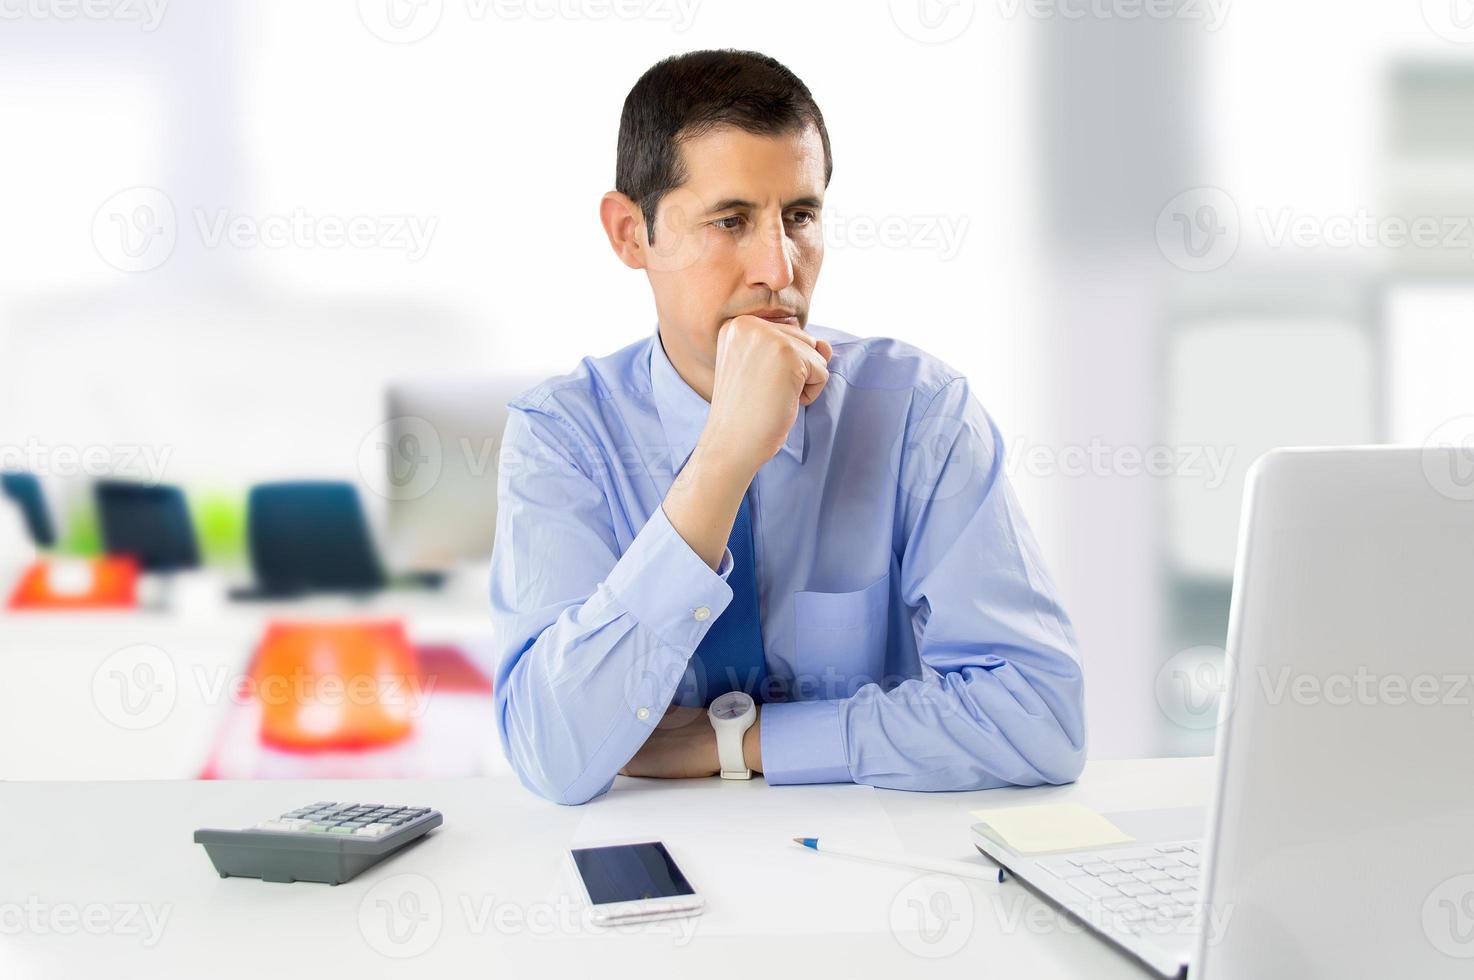 uomo d'affari pensieroso in ufficio foto